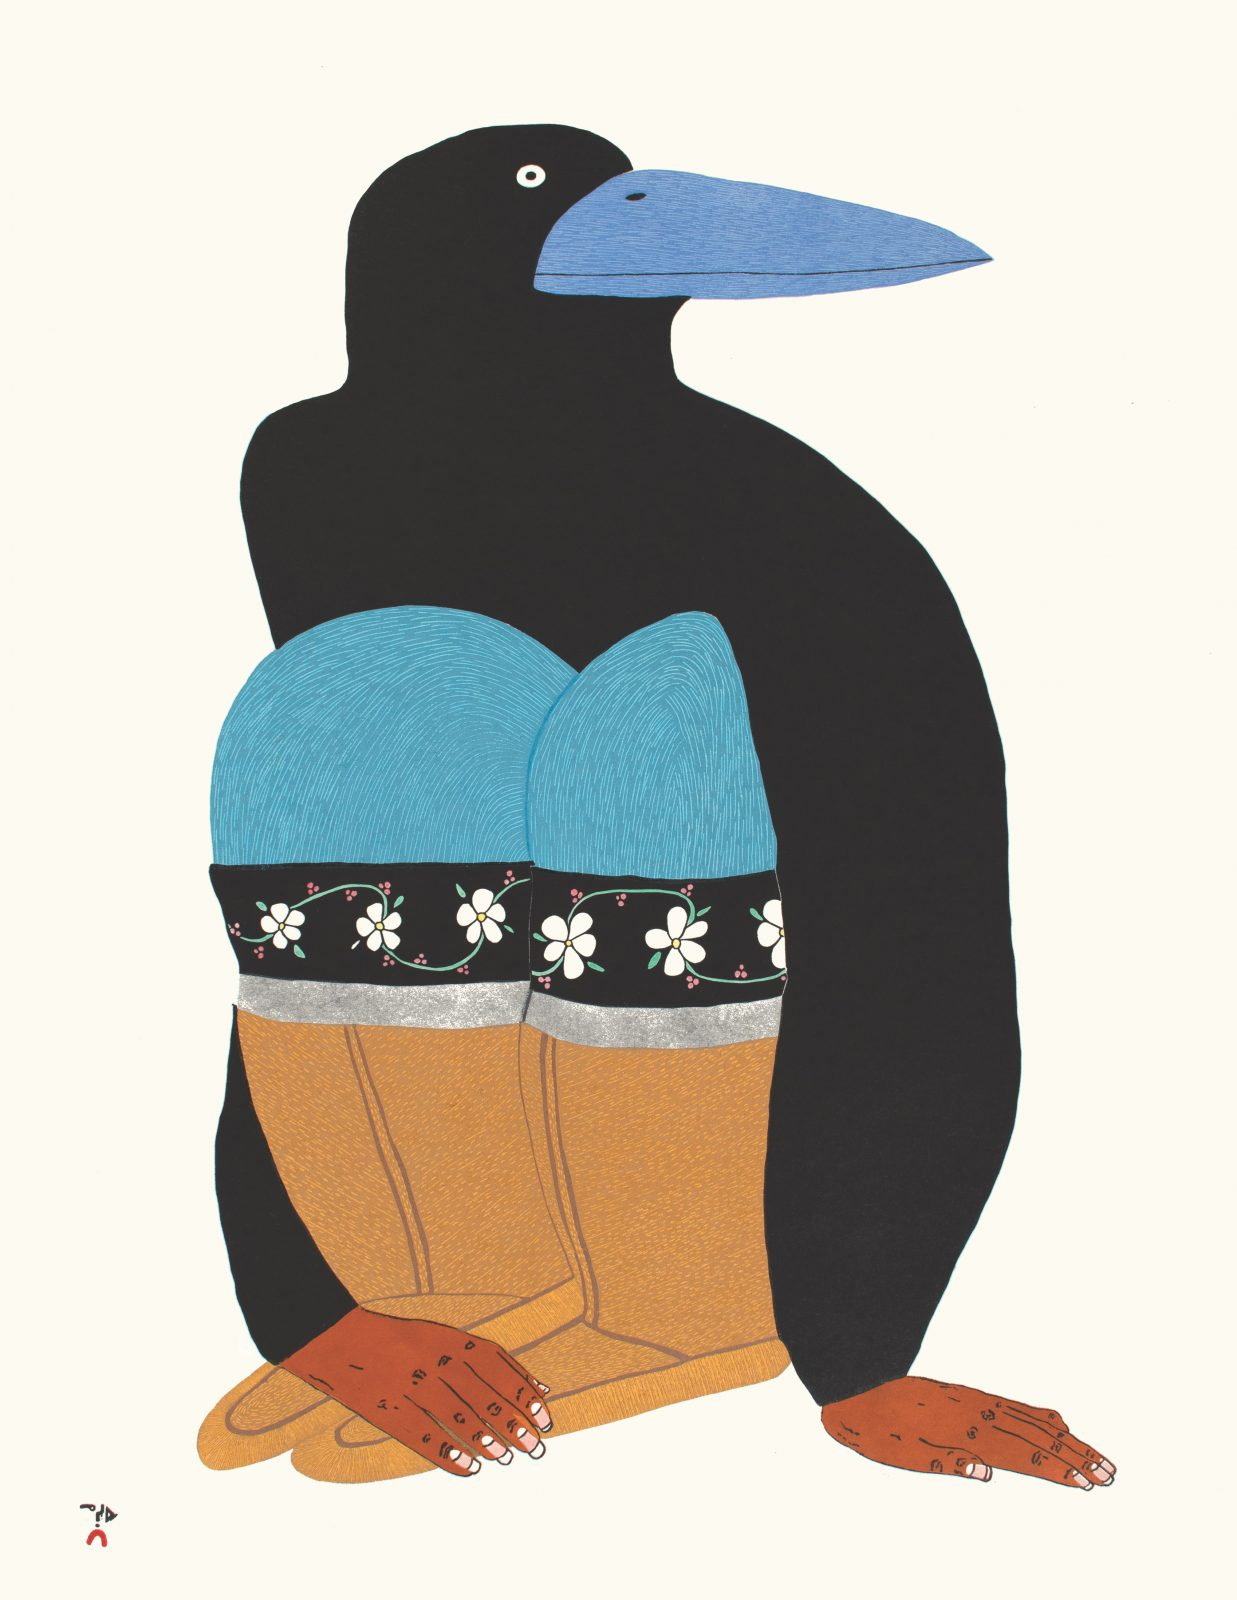 NINGIUKULU TEEVEE No Turning Back Cape Dorset Print 2021